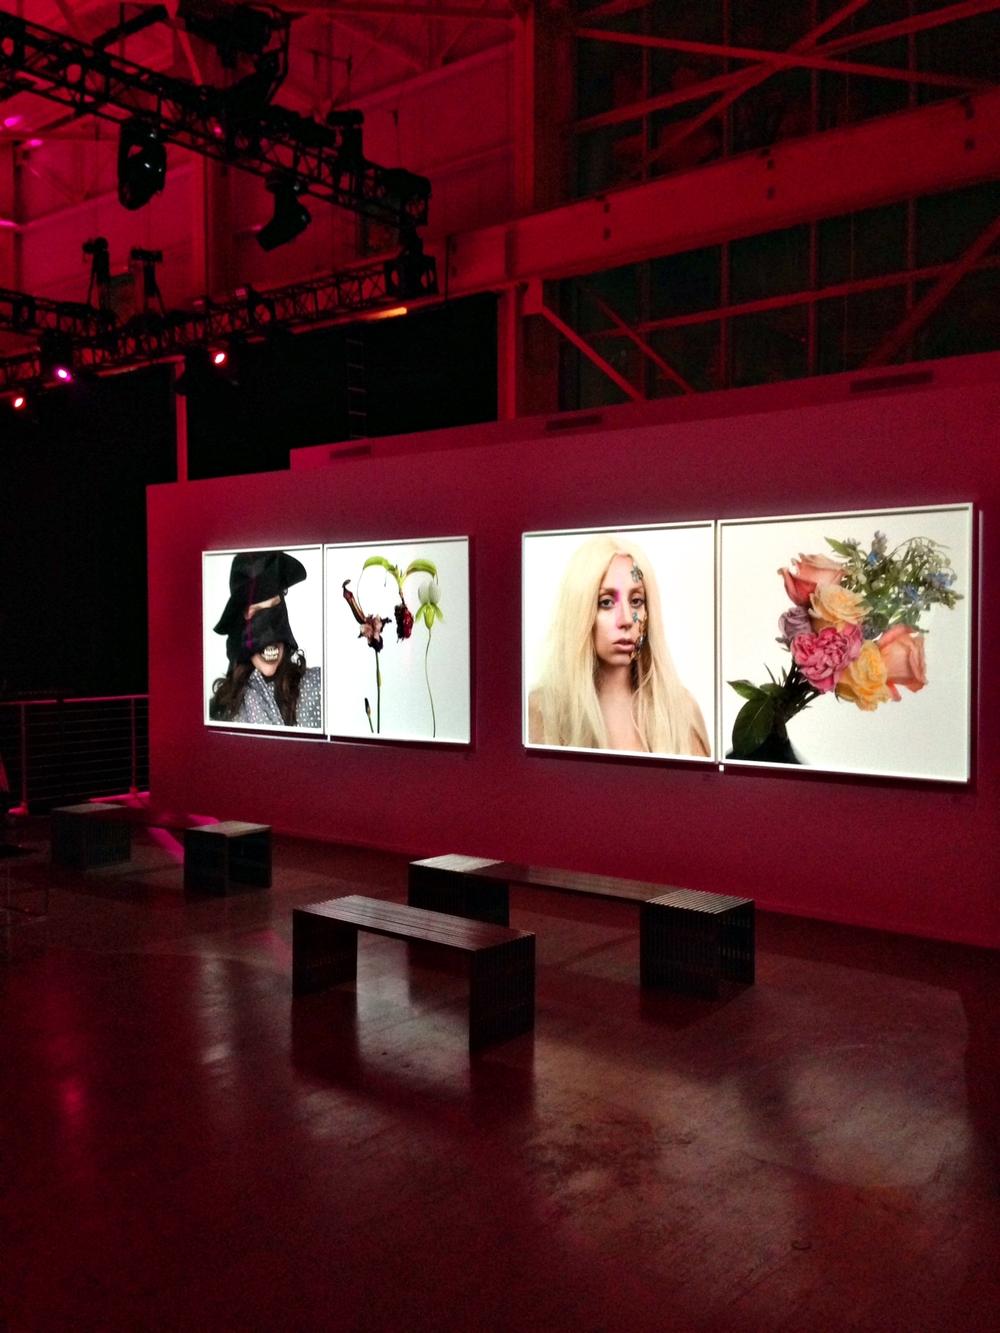 Maria-Brito_Lady-Gaga-Koons-ArtRave-8.jpg